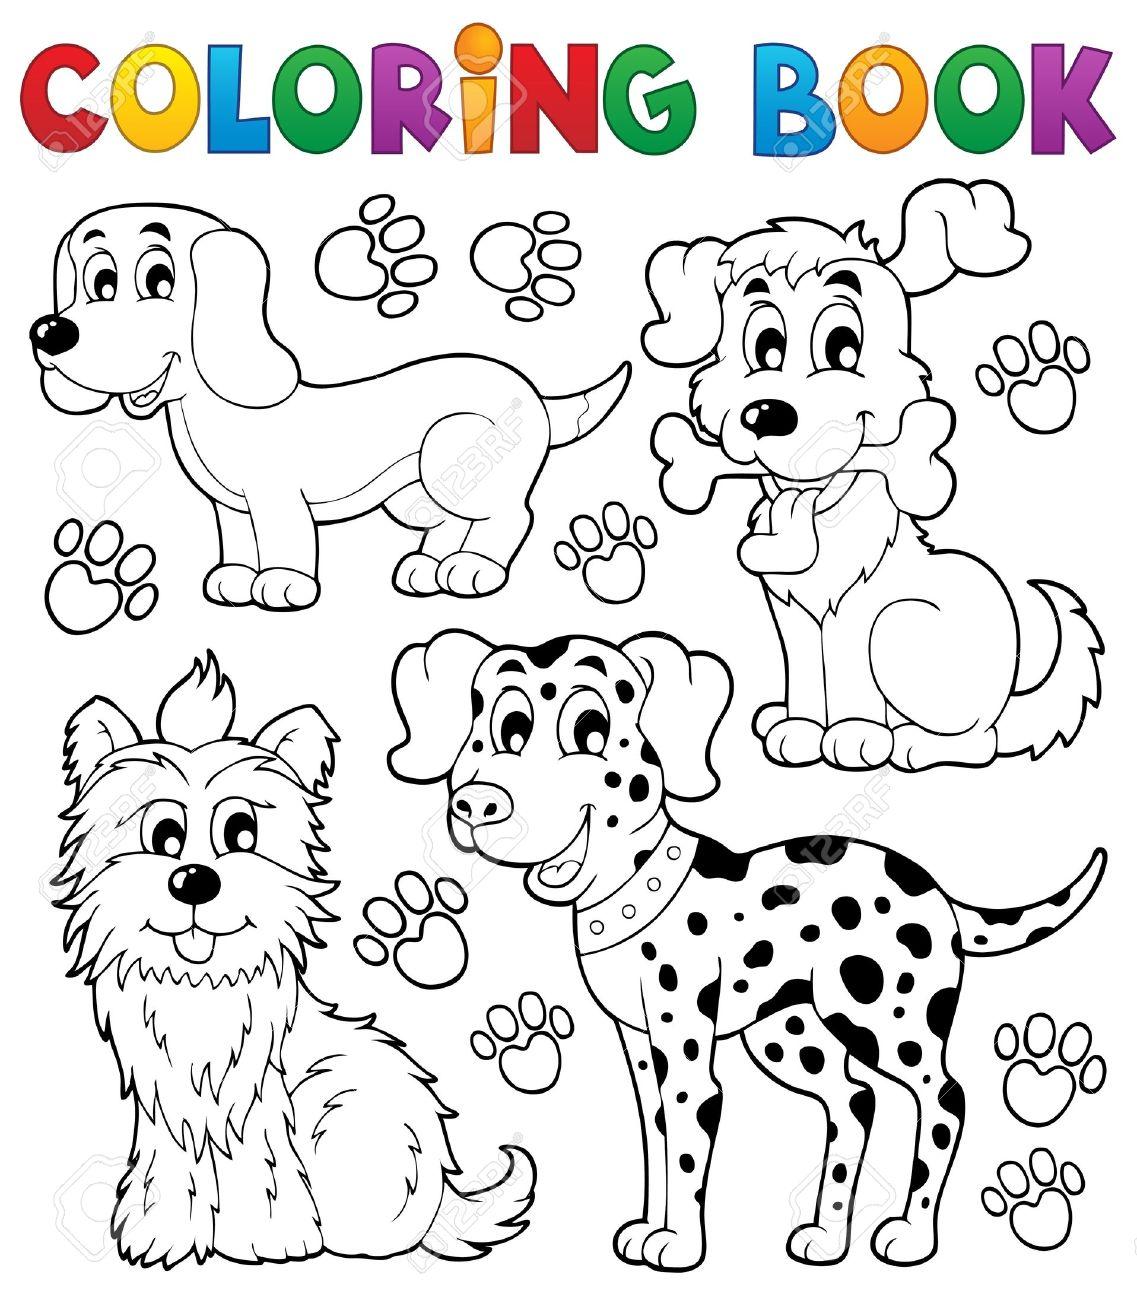 Coloring Book Dog Theme Stock Vector